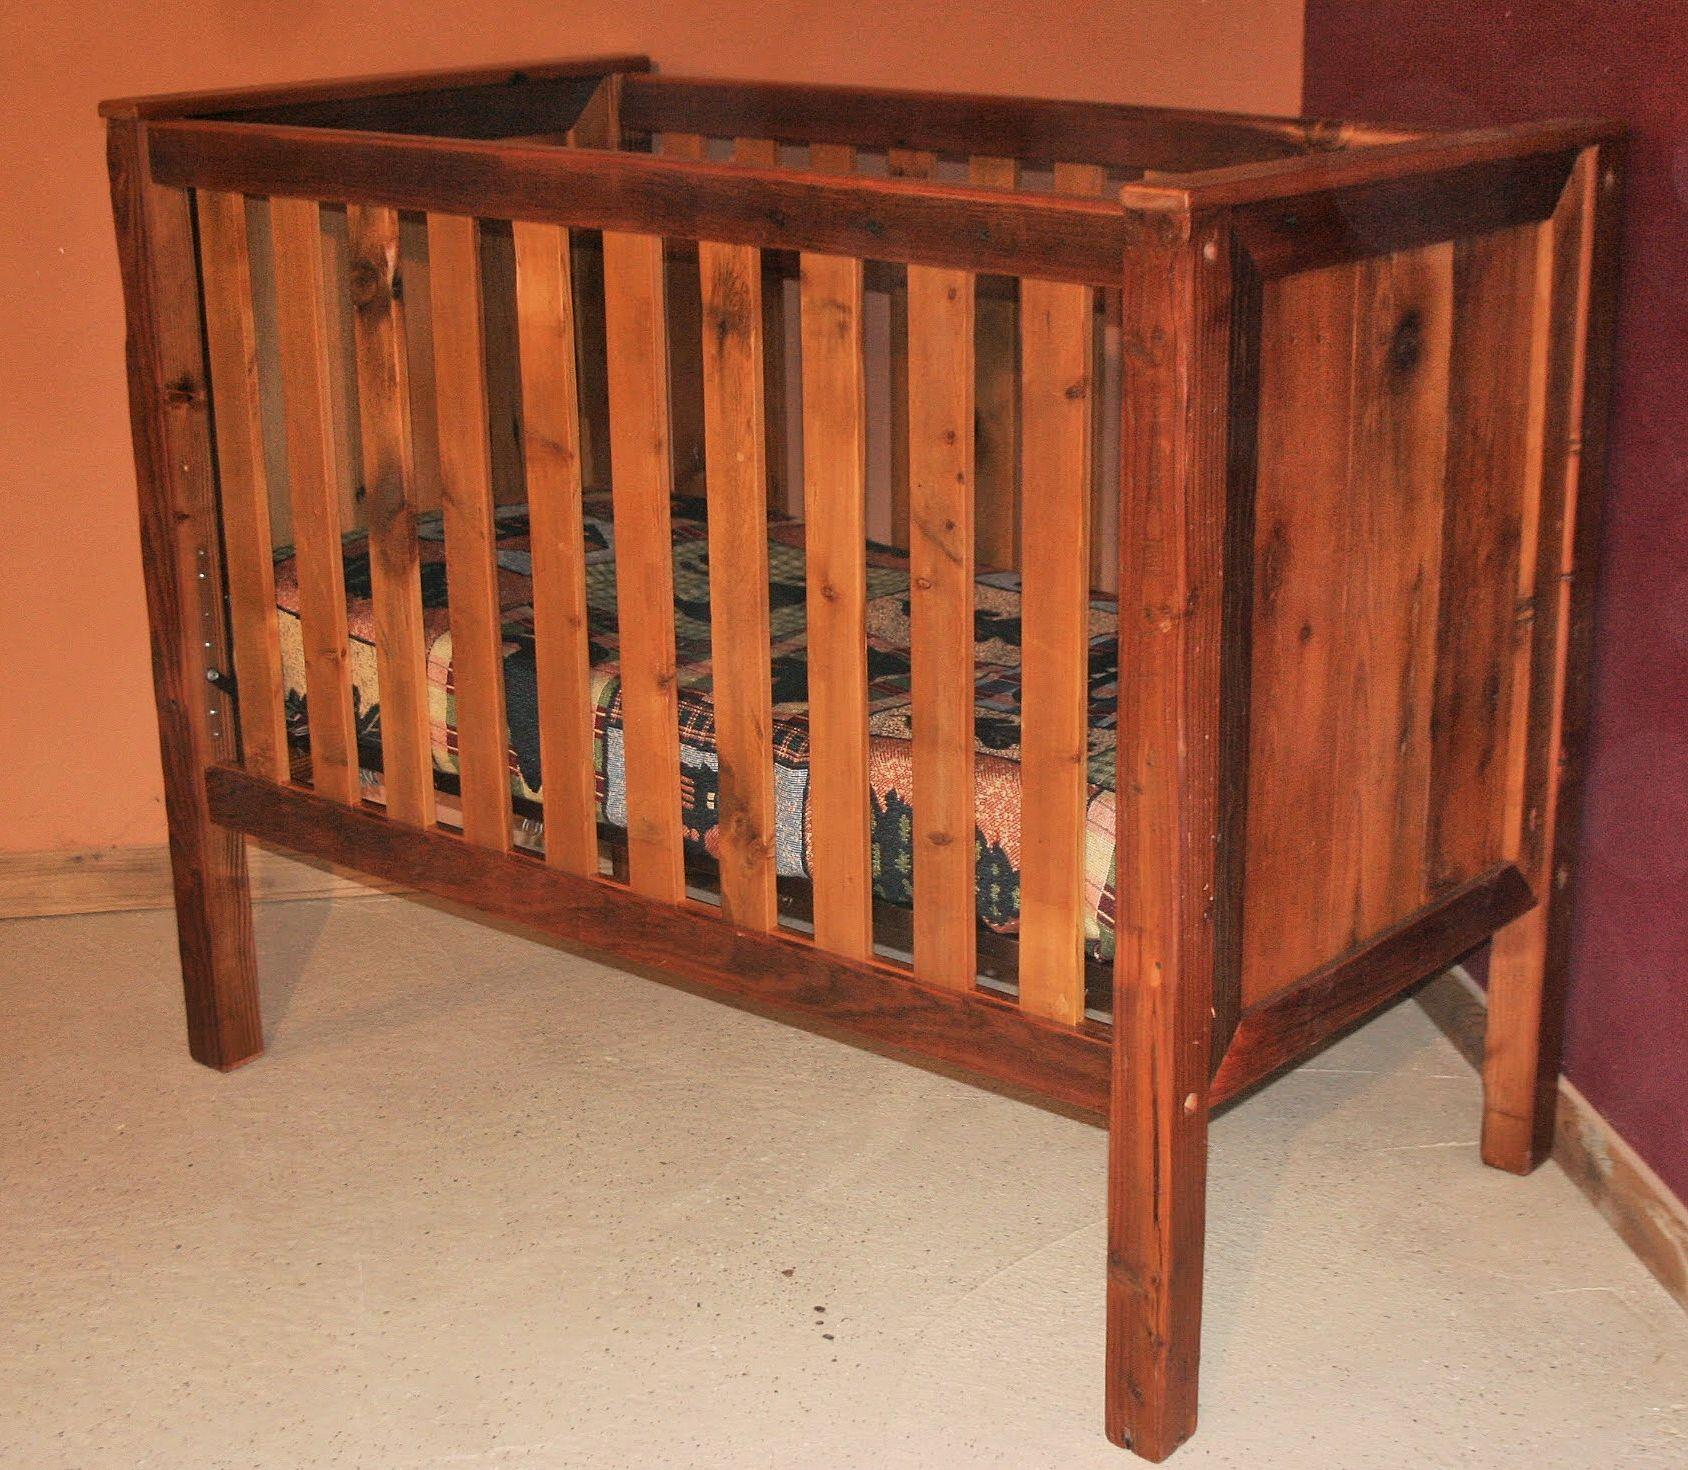 barnwood-baby-crib-20002.jpg